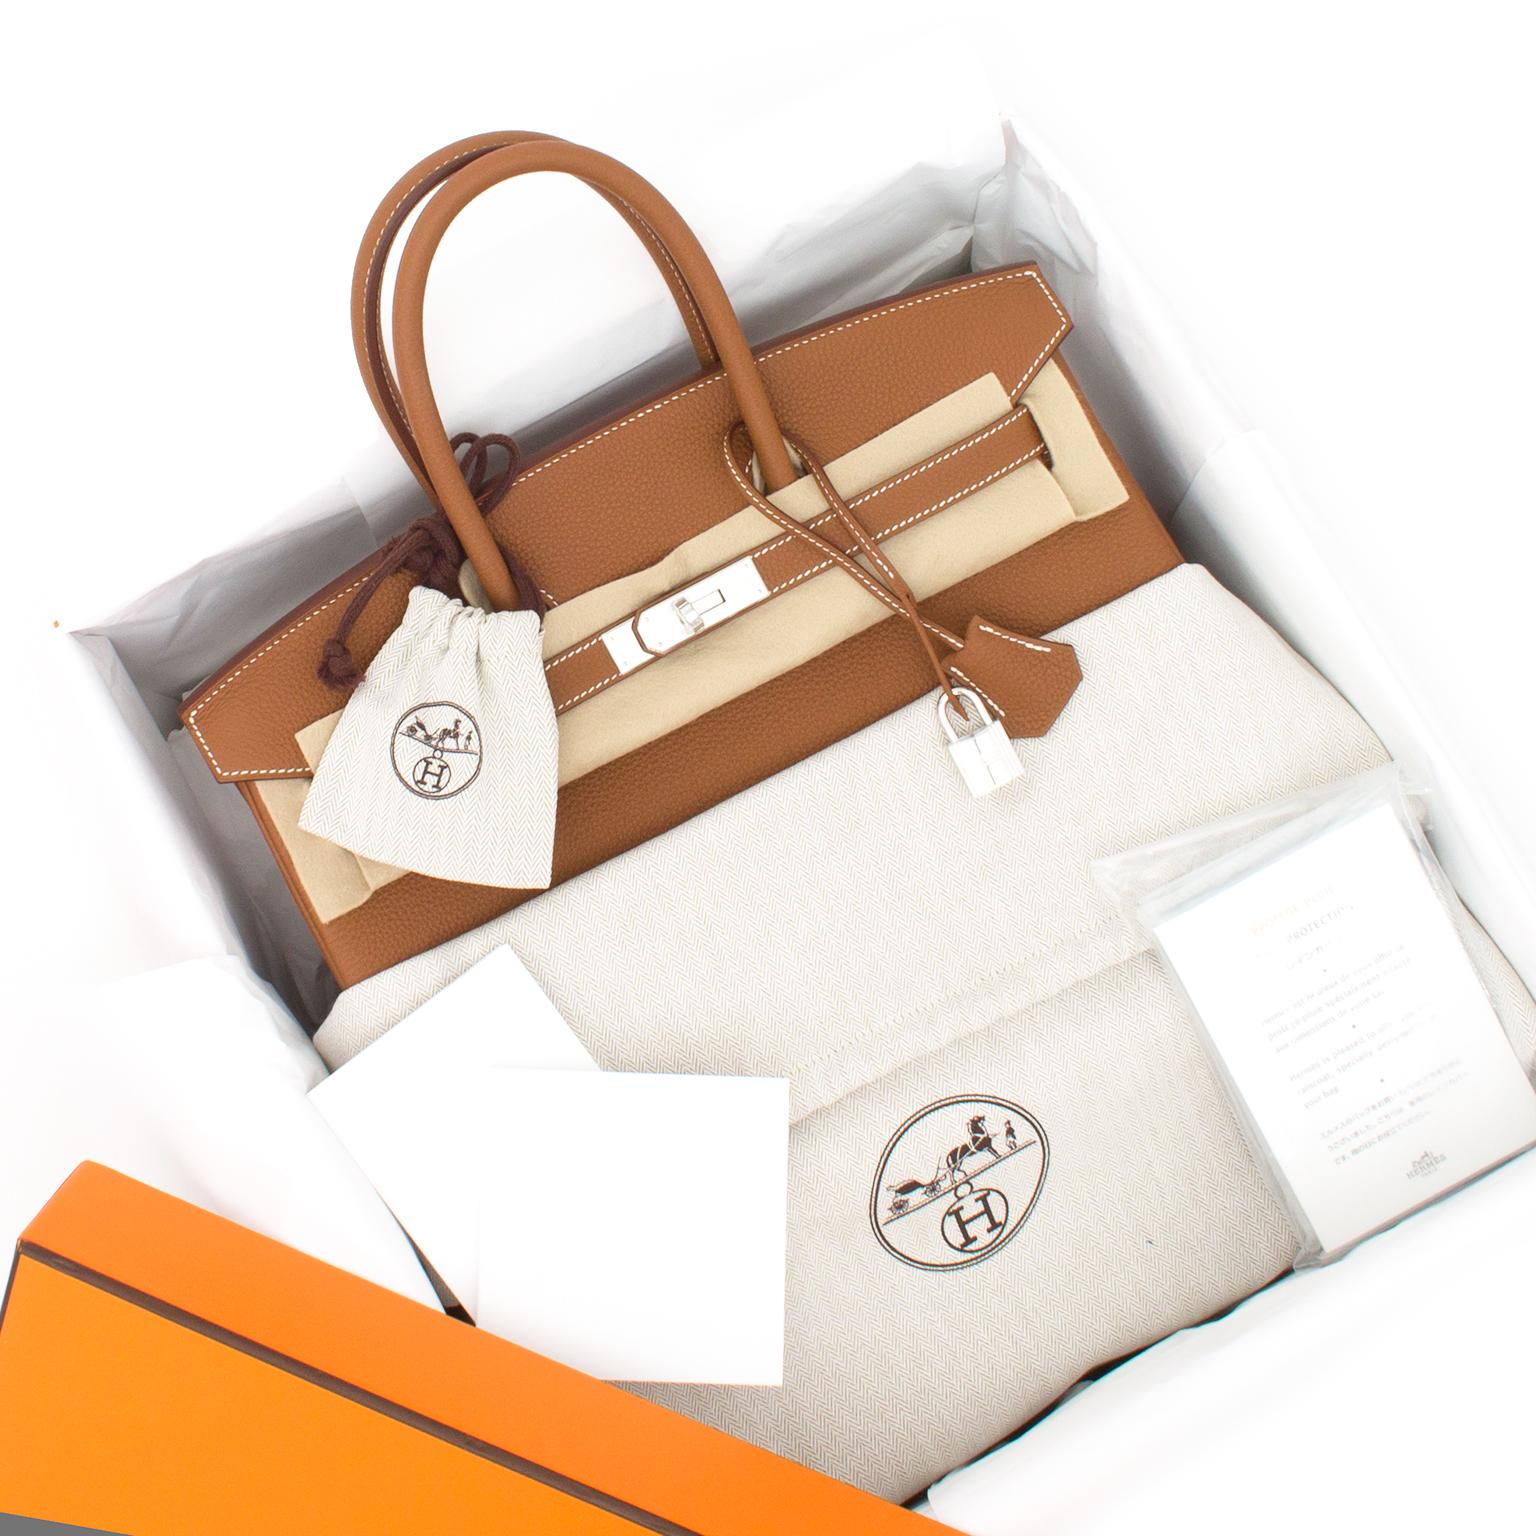 BRAND NEW Hermès Birkin Bag 35 PHW Togo Gold worldwide shipping , receipt and box